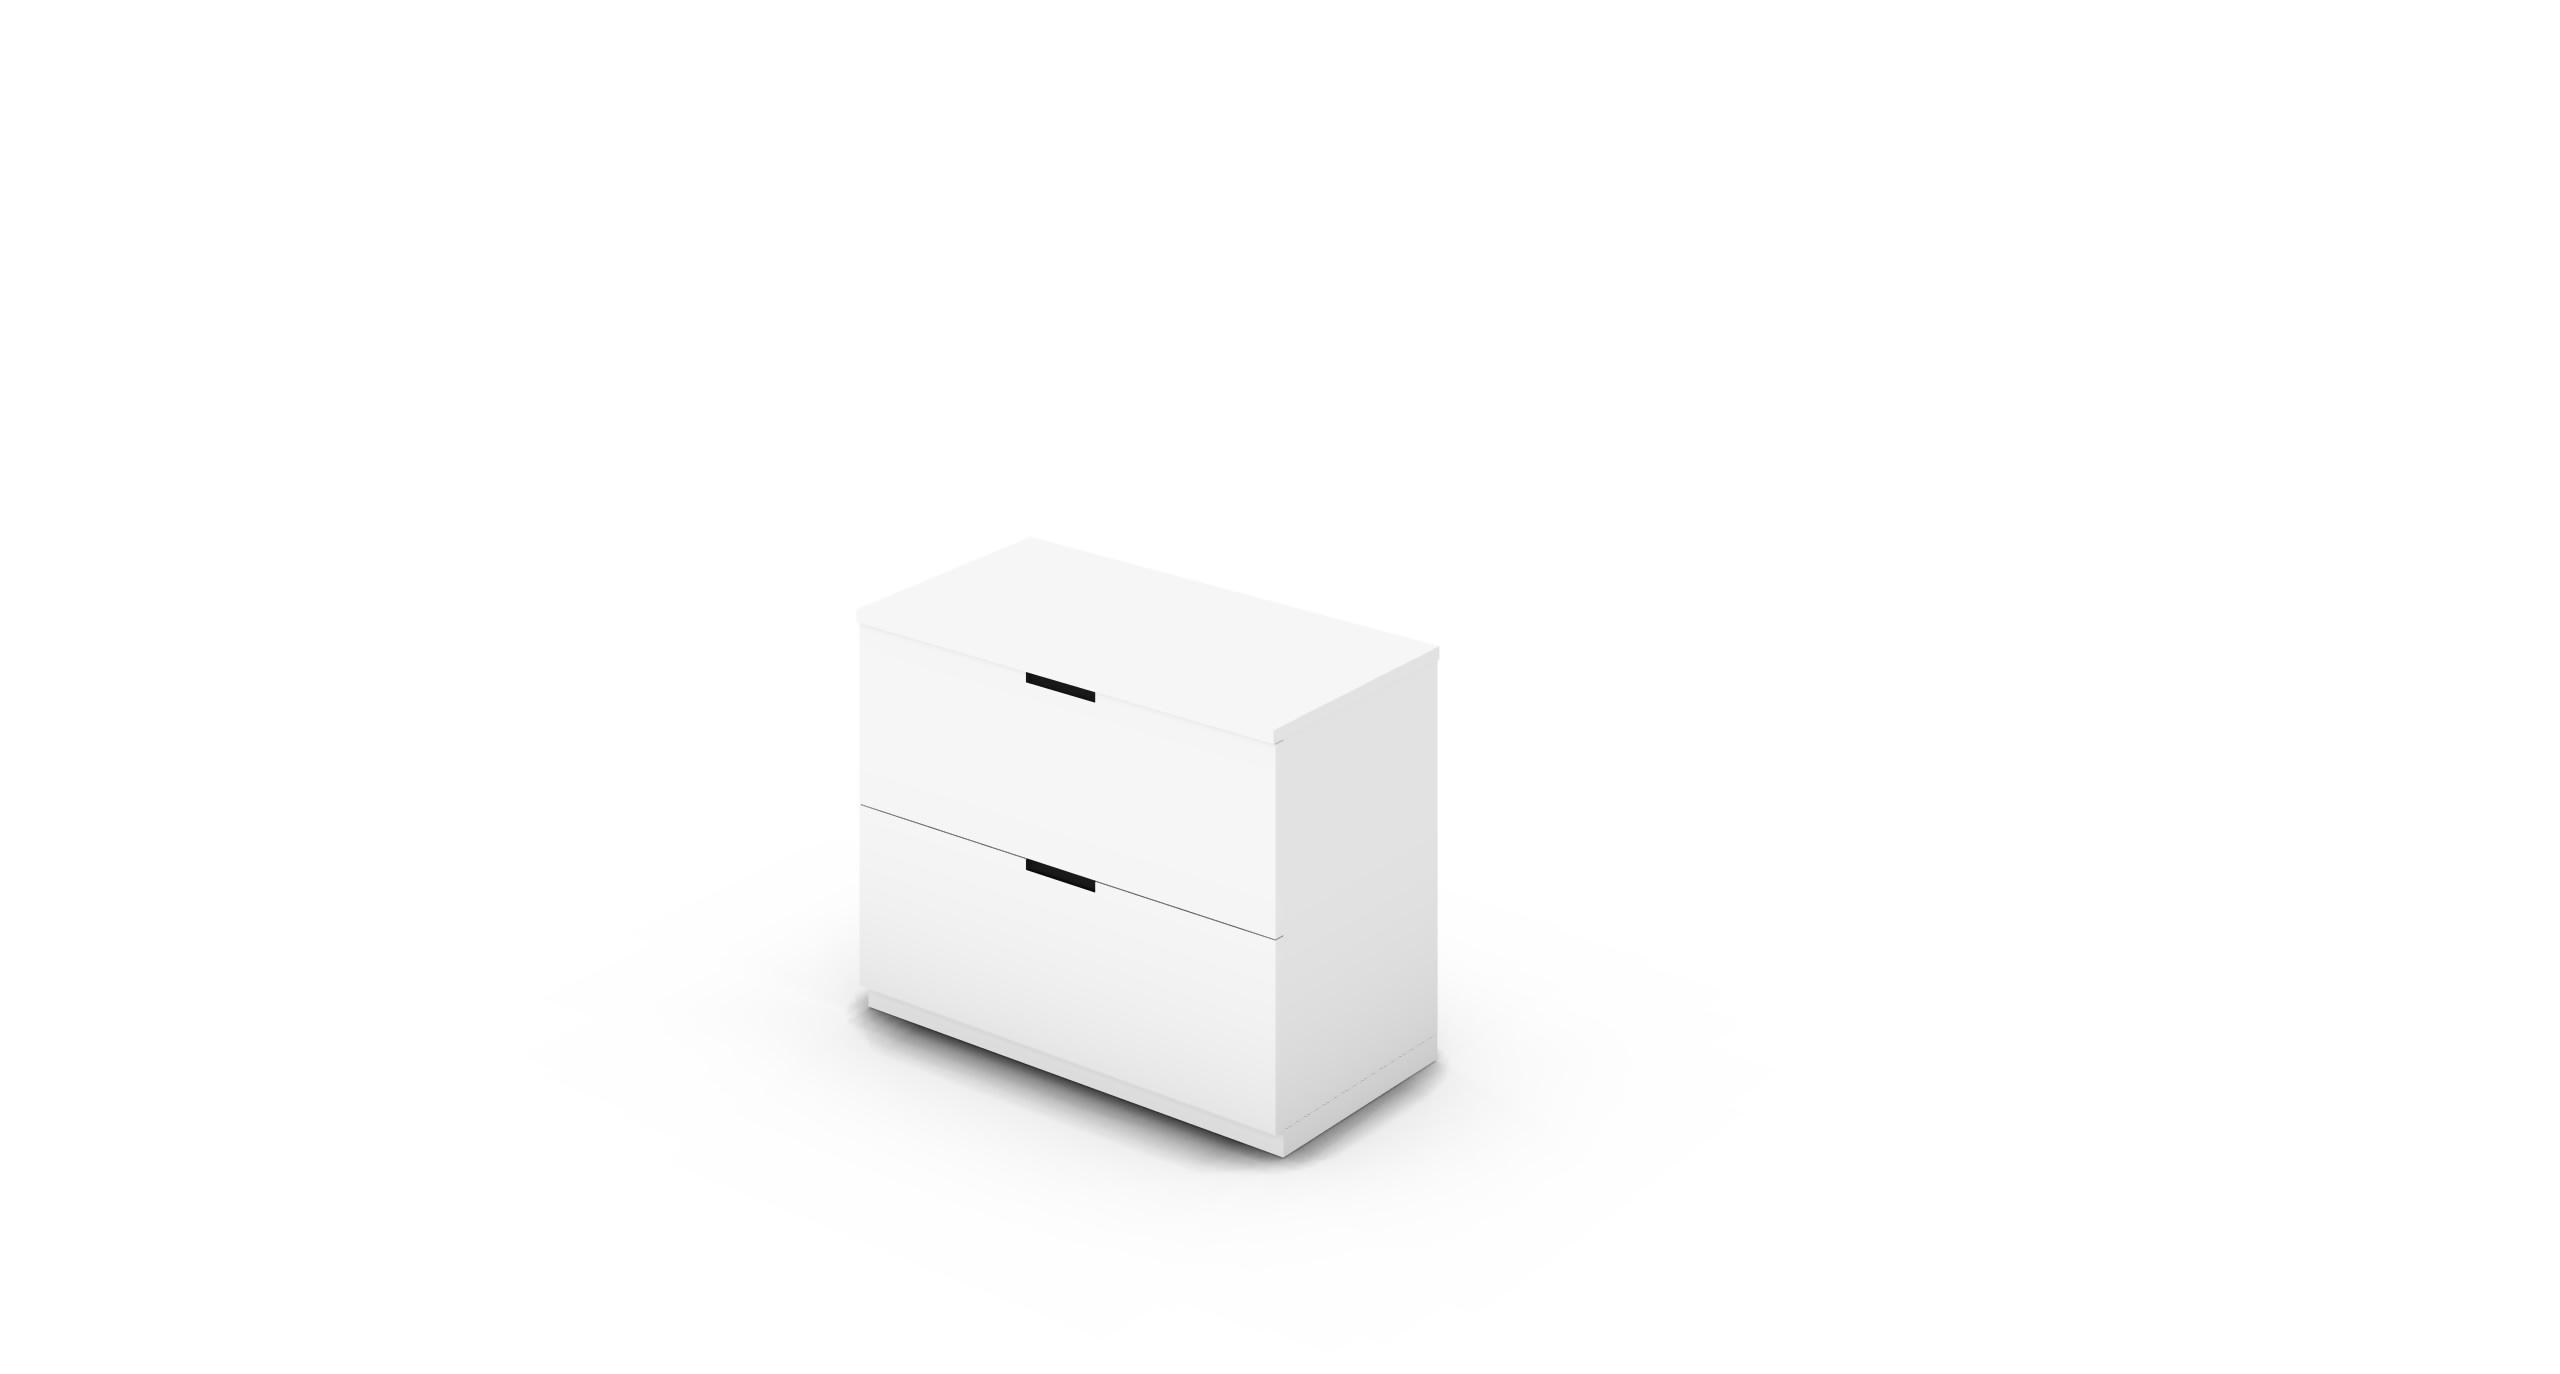 Cabinet_900x450x775_DR_White_CutOut_NoCylinder